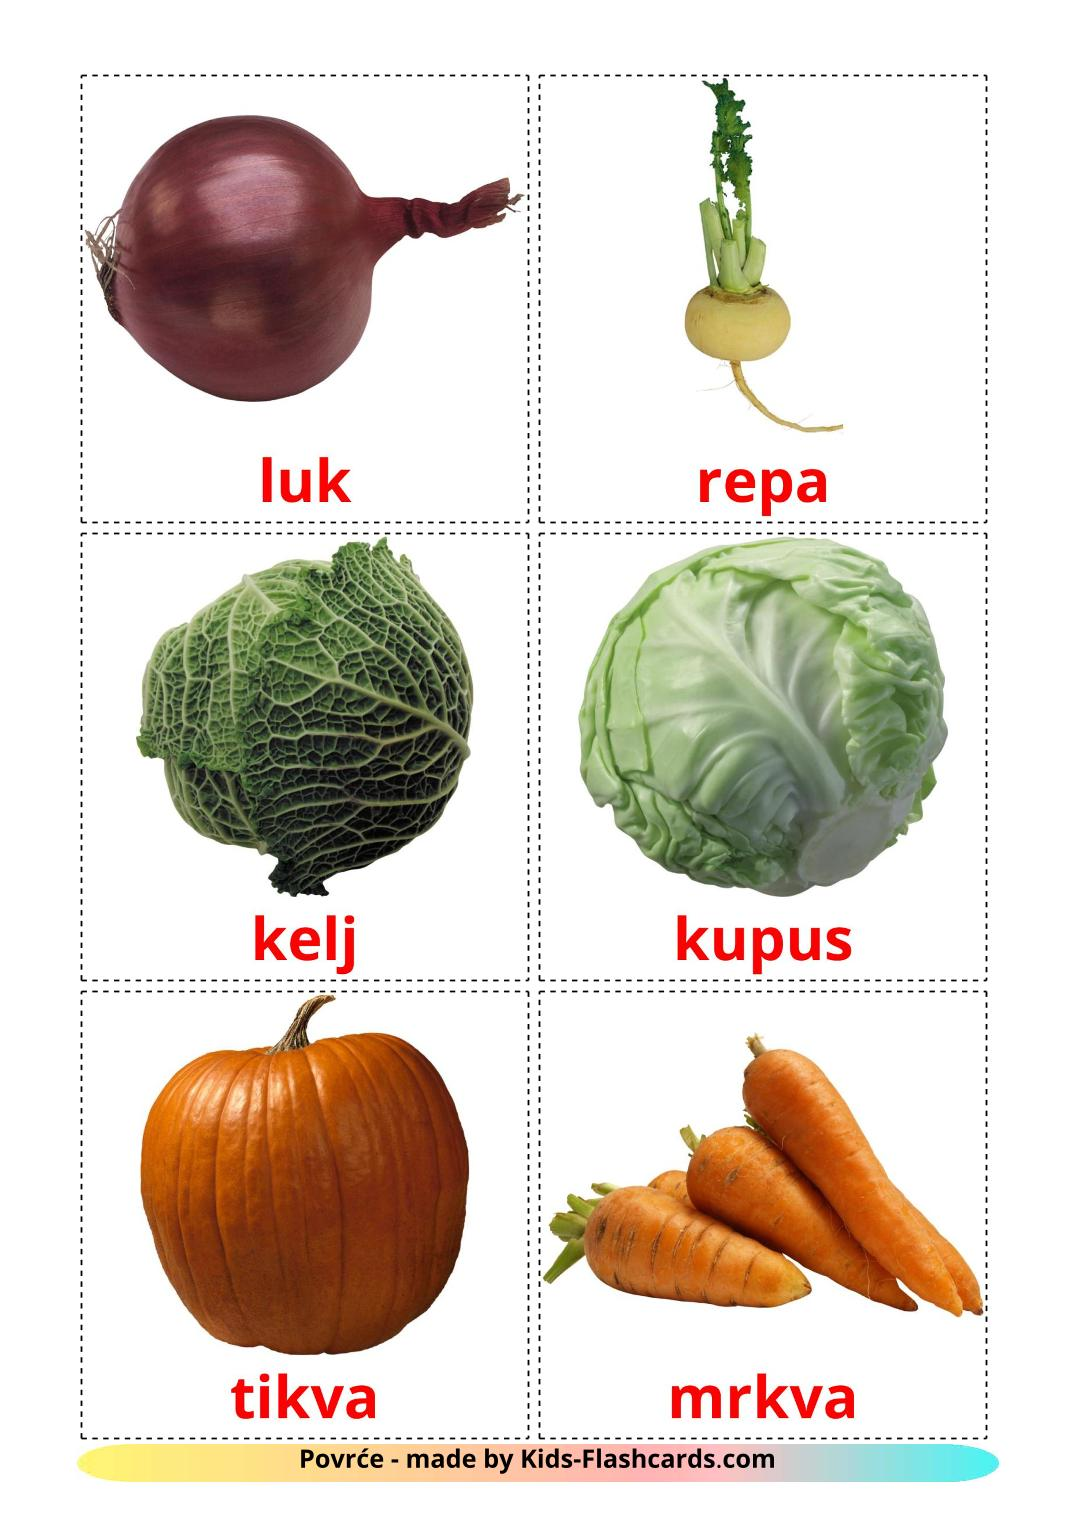 Vegetables - 29 Free Printable bosnian Flashcards